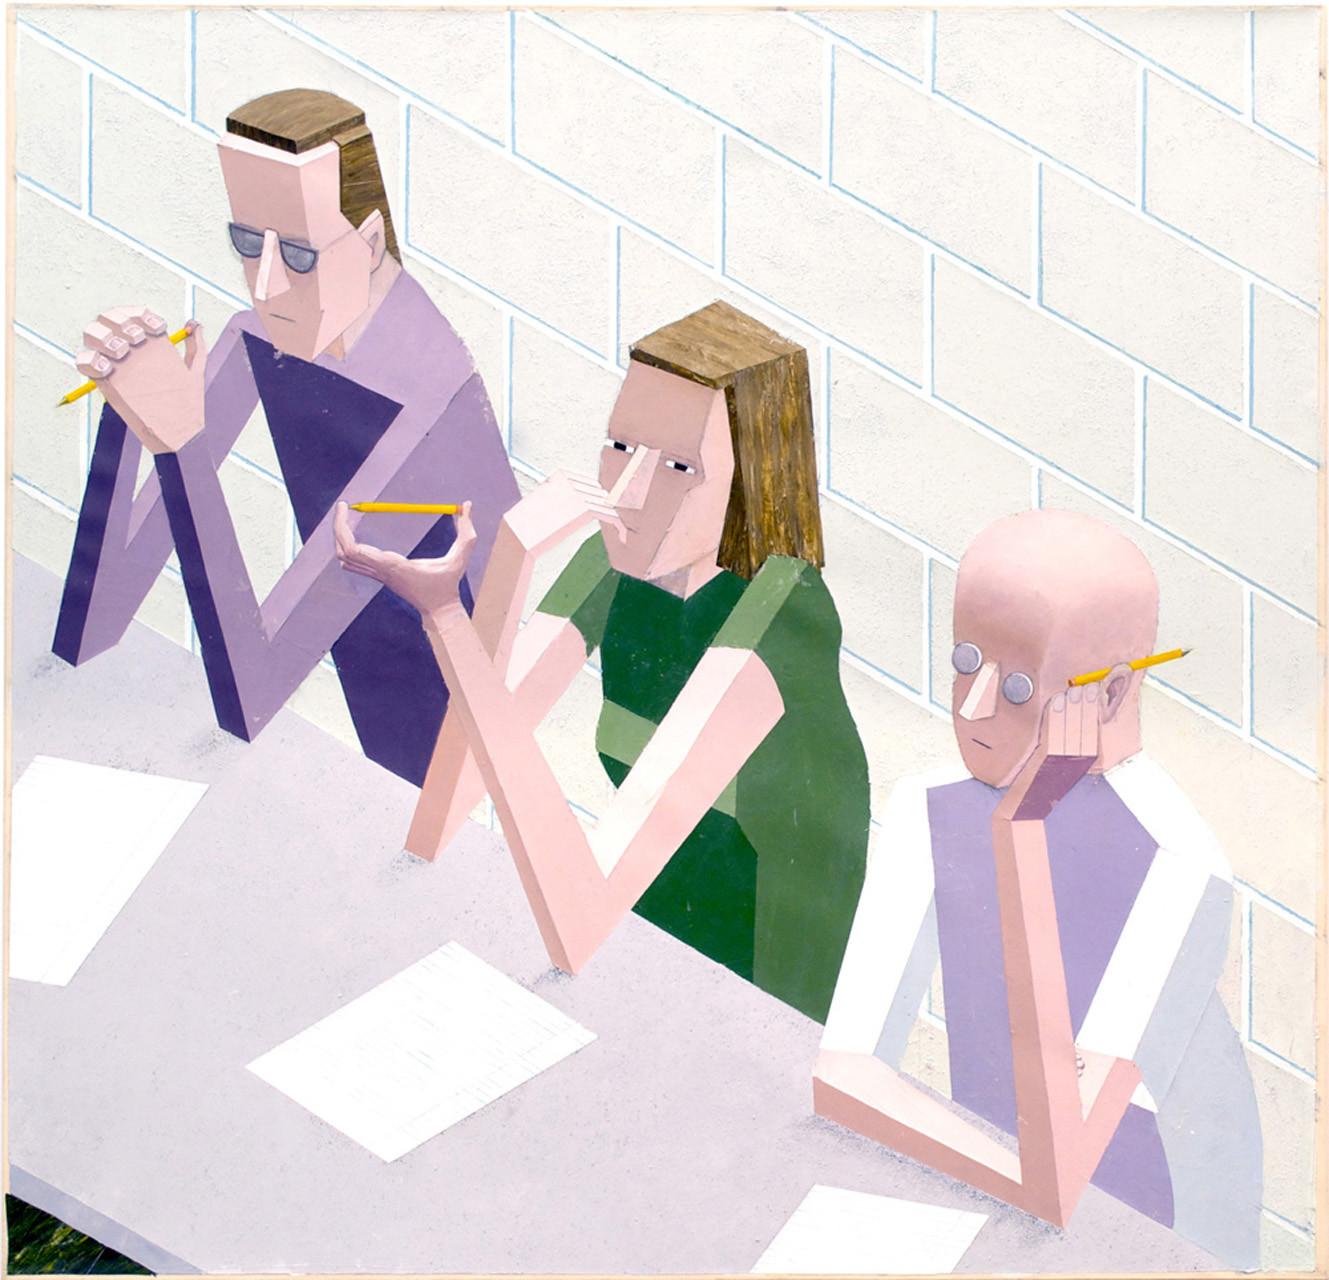 "<div class=""artwork_caption""><p>Mernet Larsen, Taking Notes, 2004</p></div>"